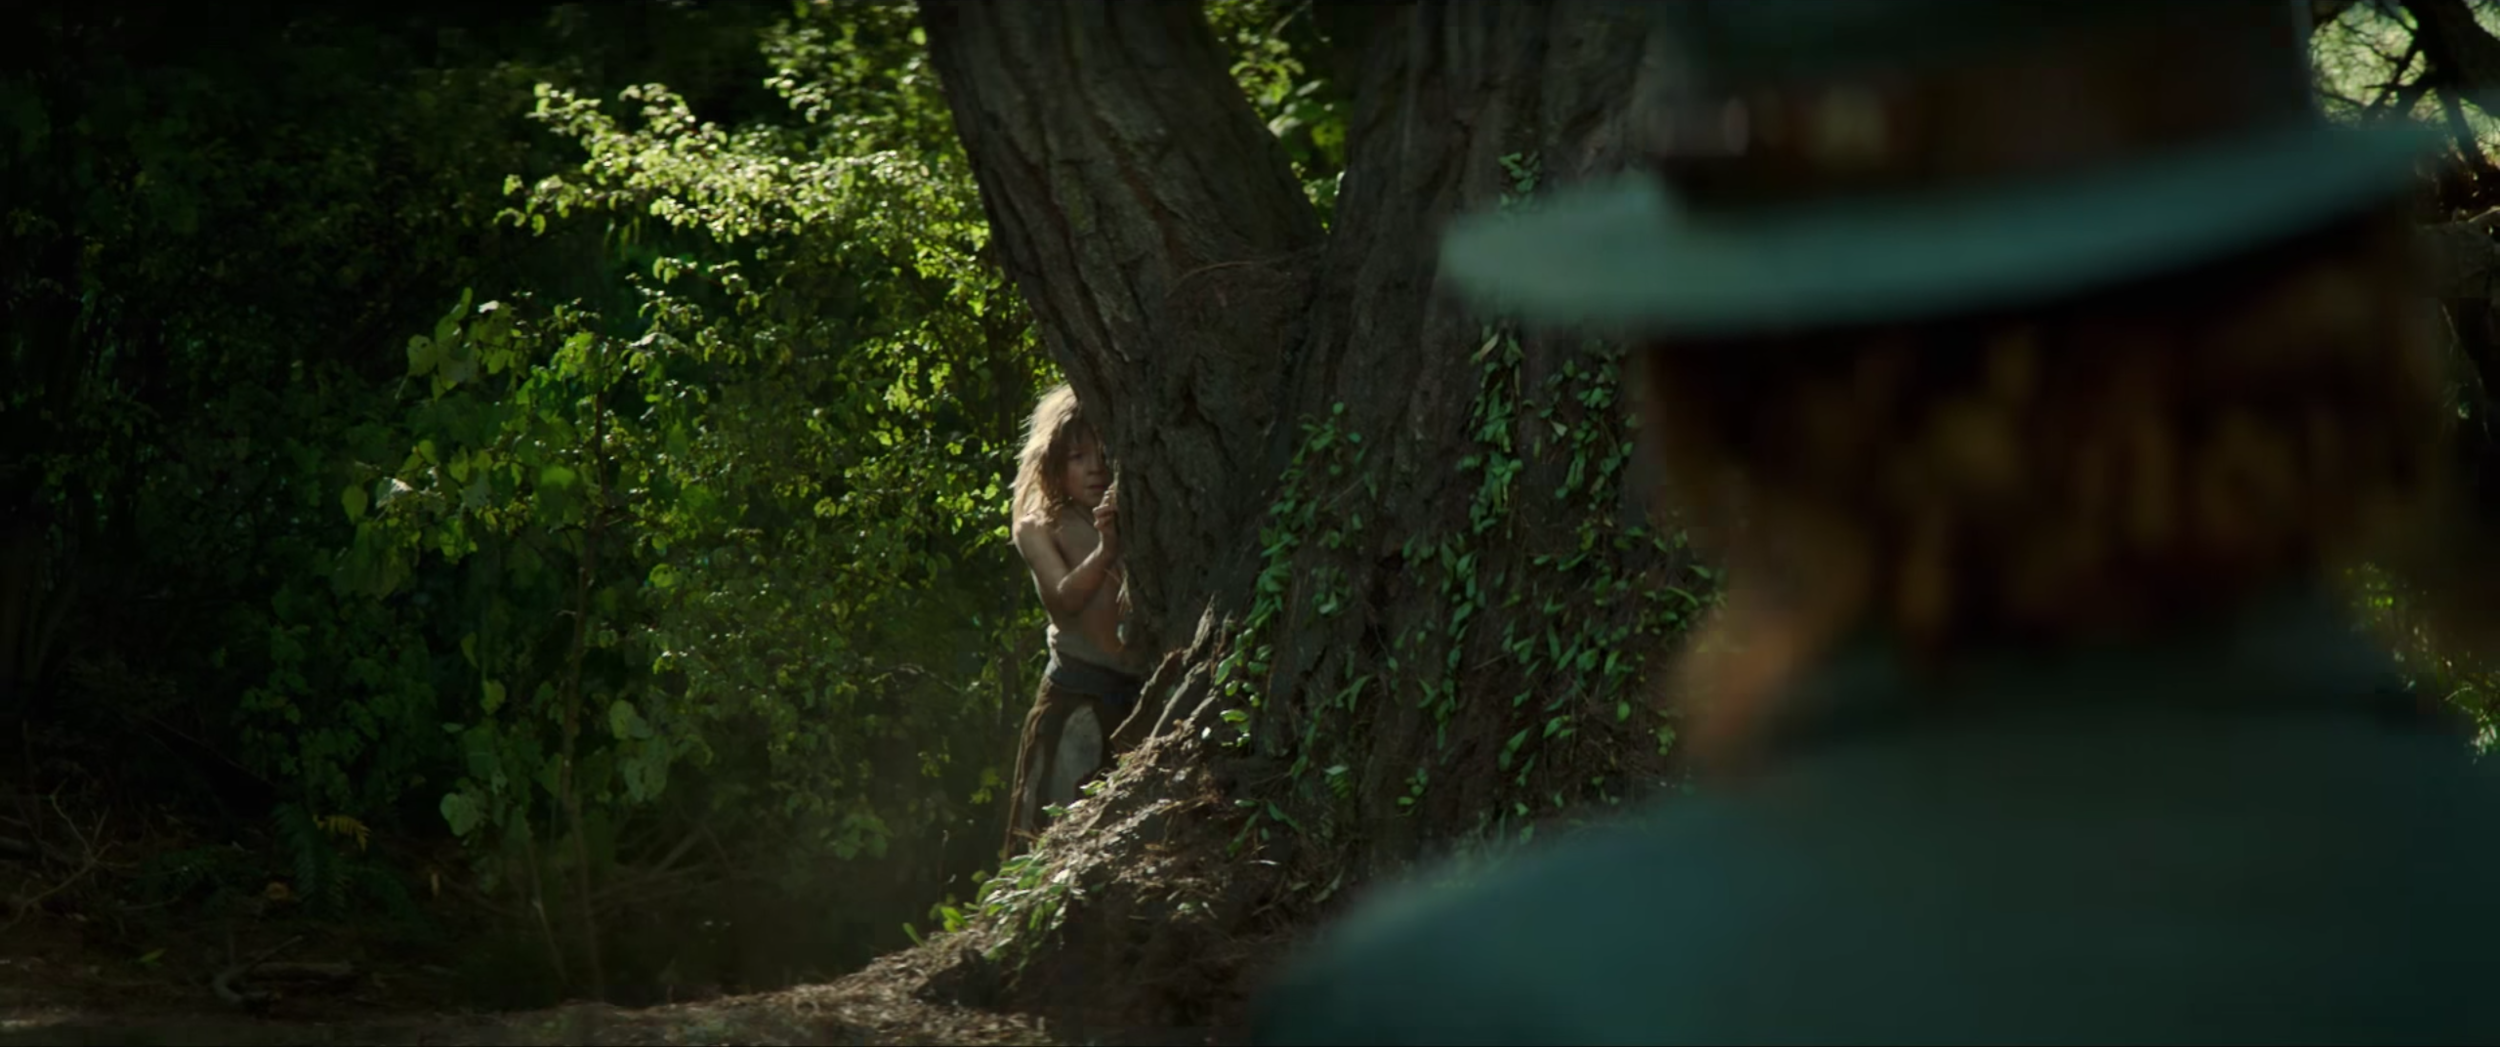 Mowgli is that you?